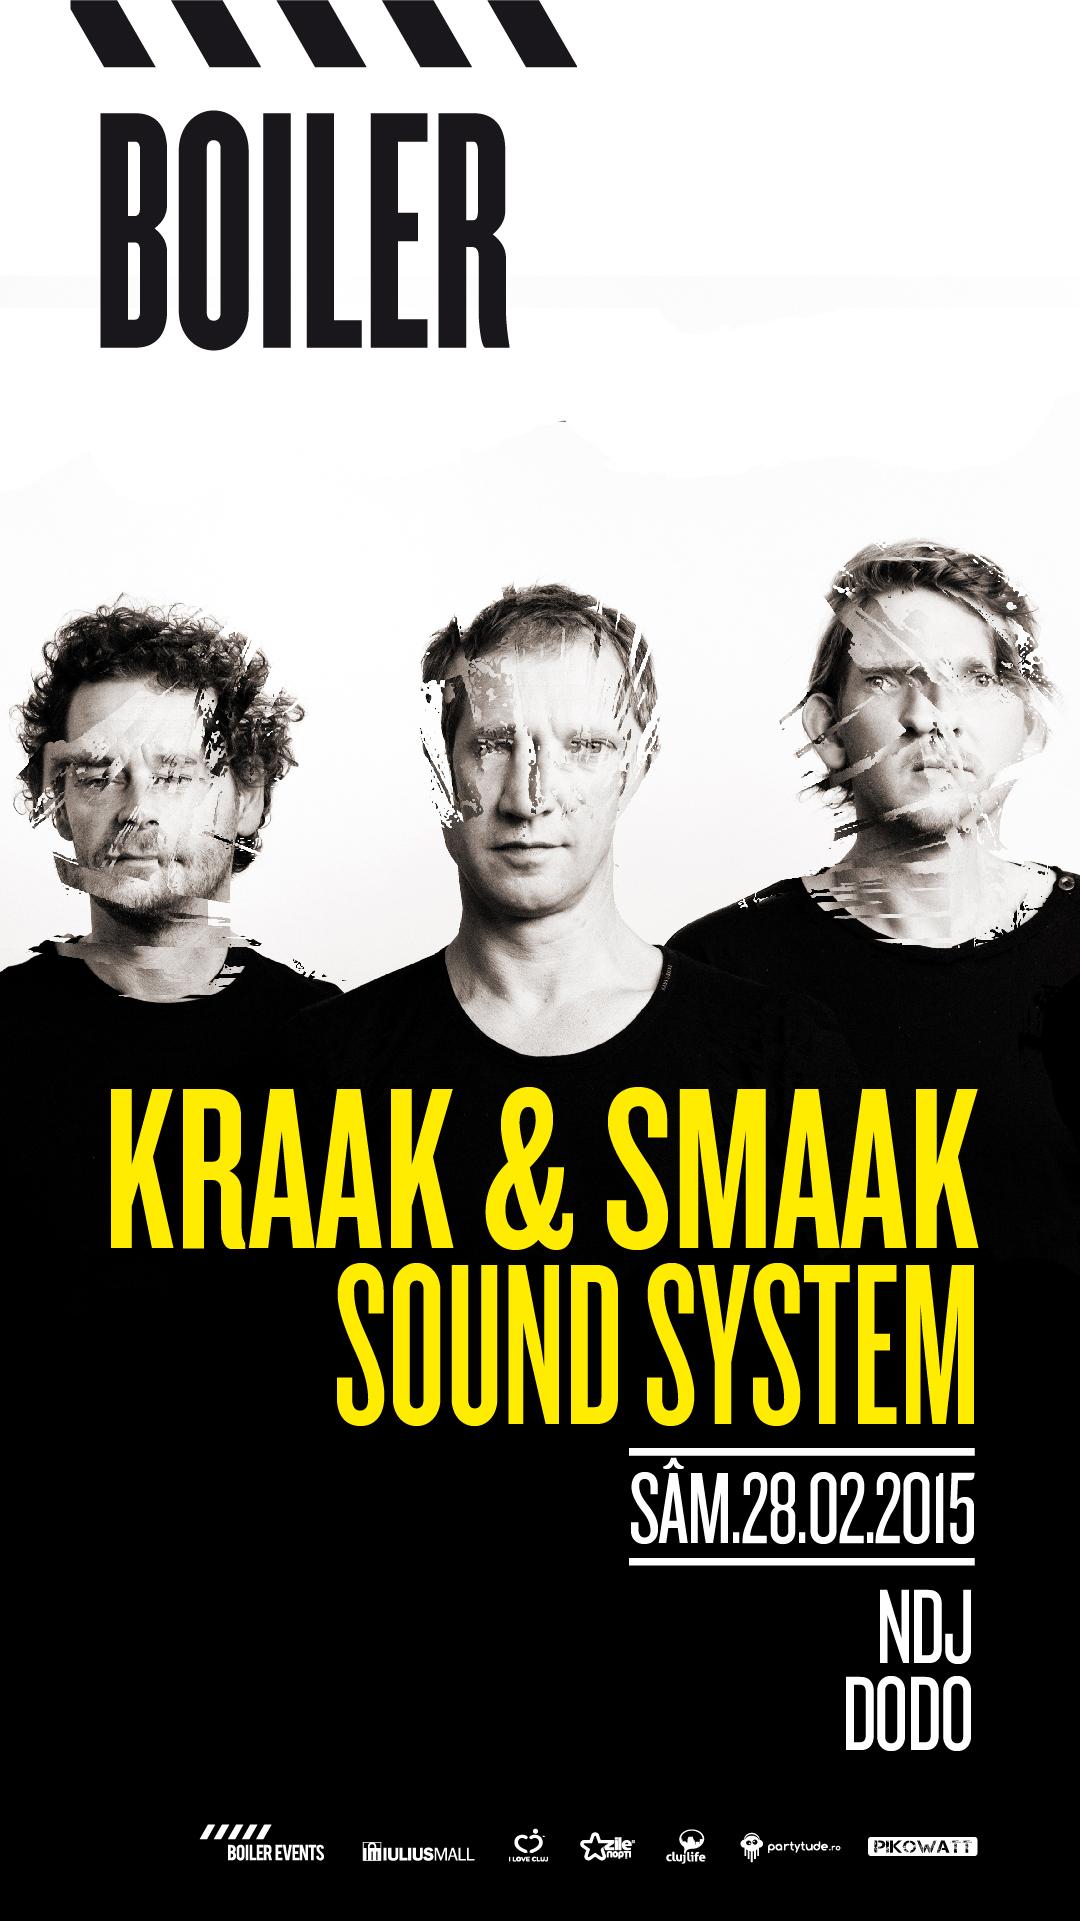 Kraak & Smaak Sound System @ Boiler Club